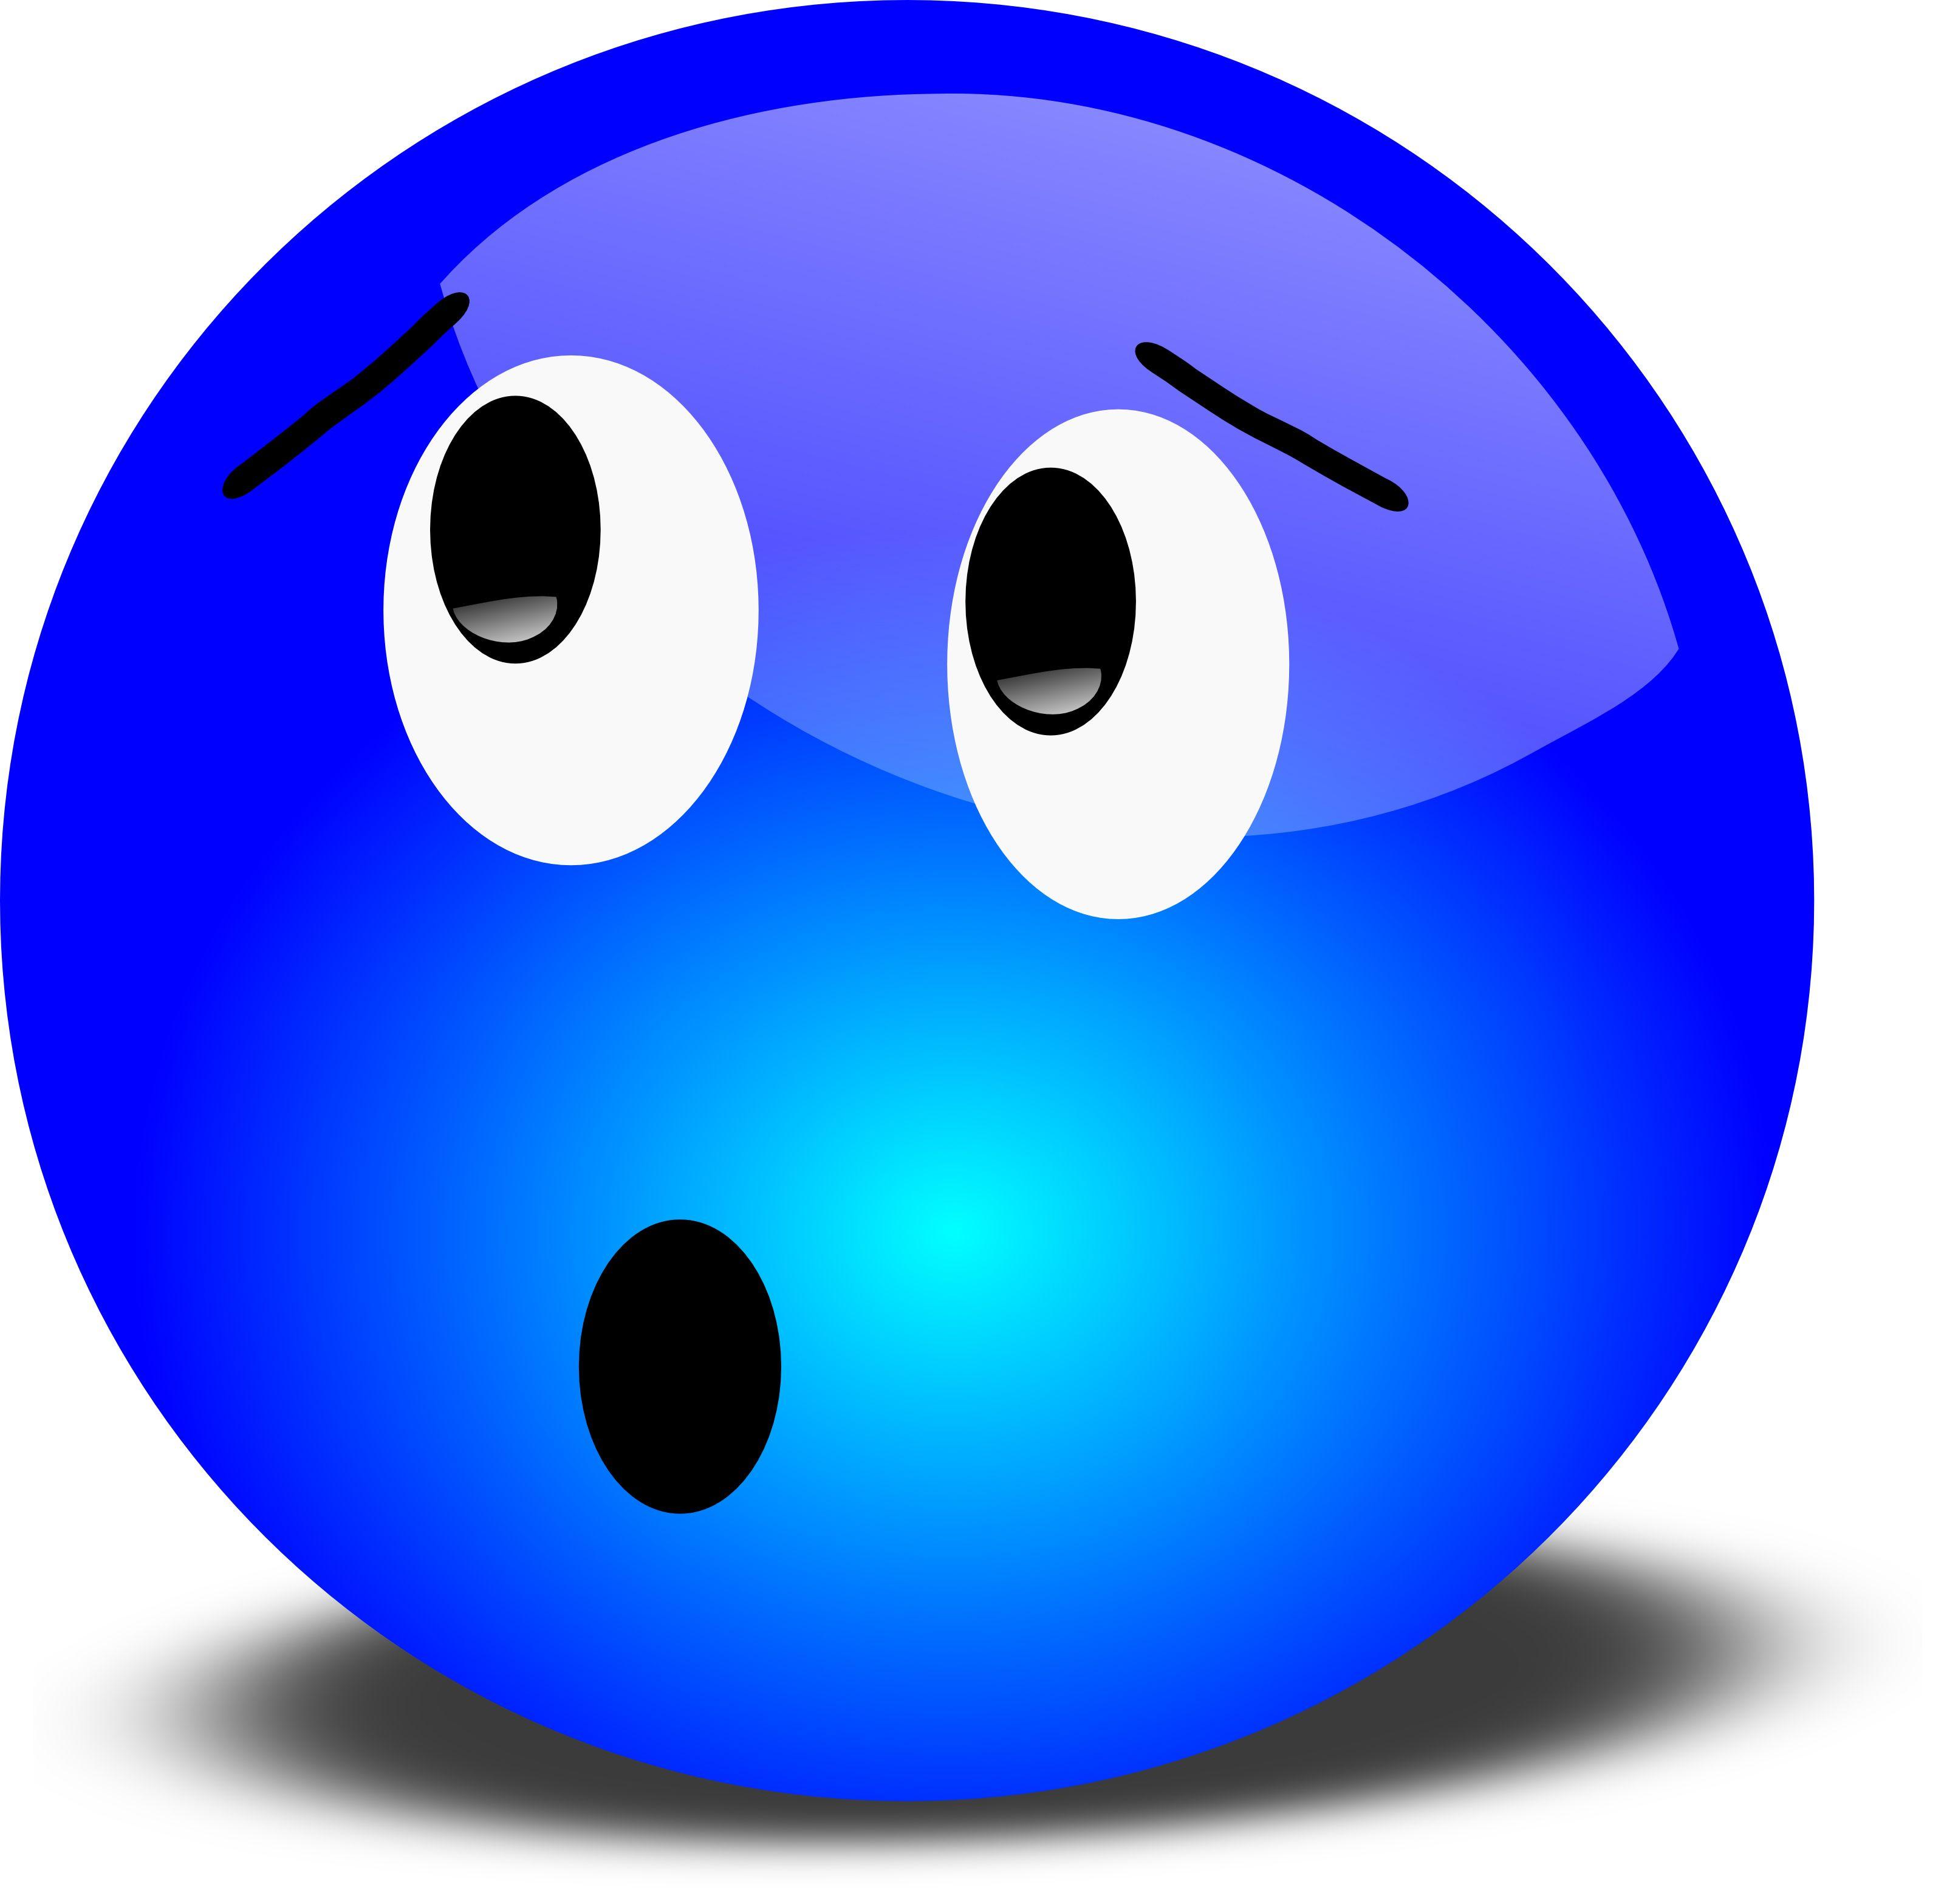 Pin by jen favor on smileys pinterest free illustrations blue emoji smiley emoji emoji faces smiley faces free illustrations clipart images funny faces smileys squat buycottarizona Gallery